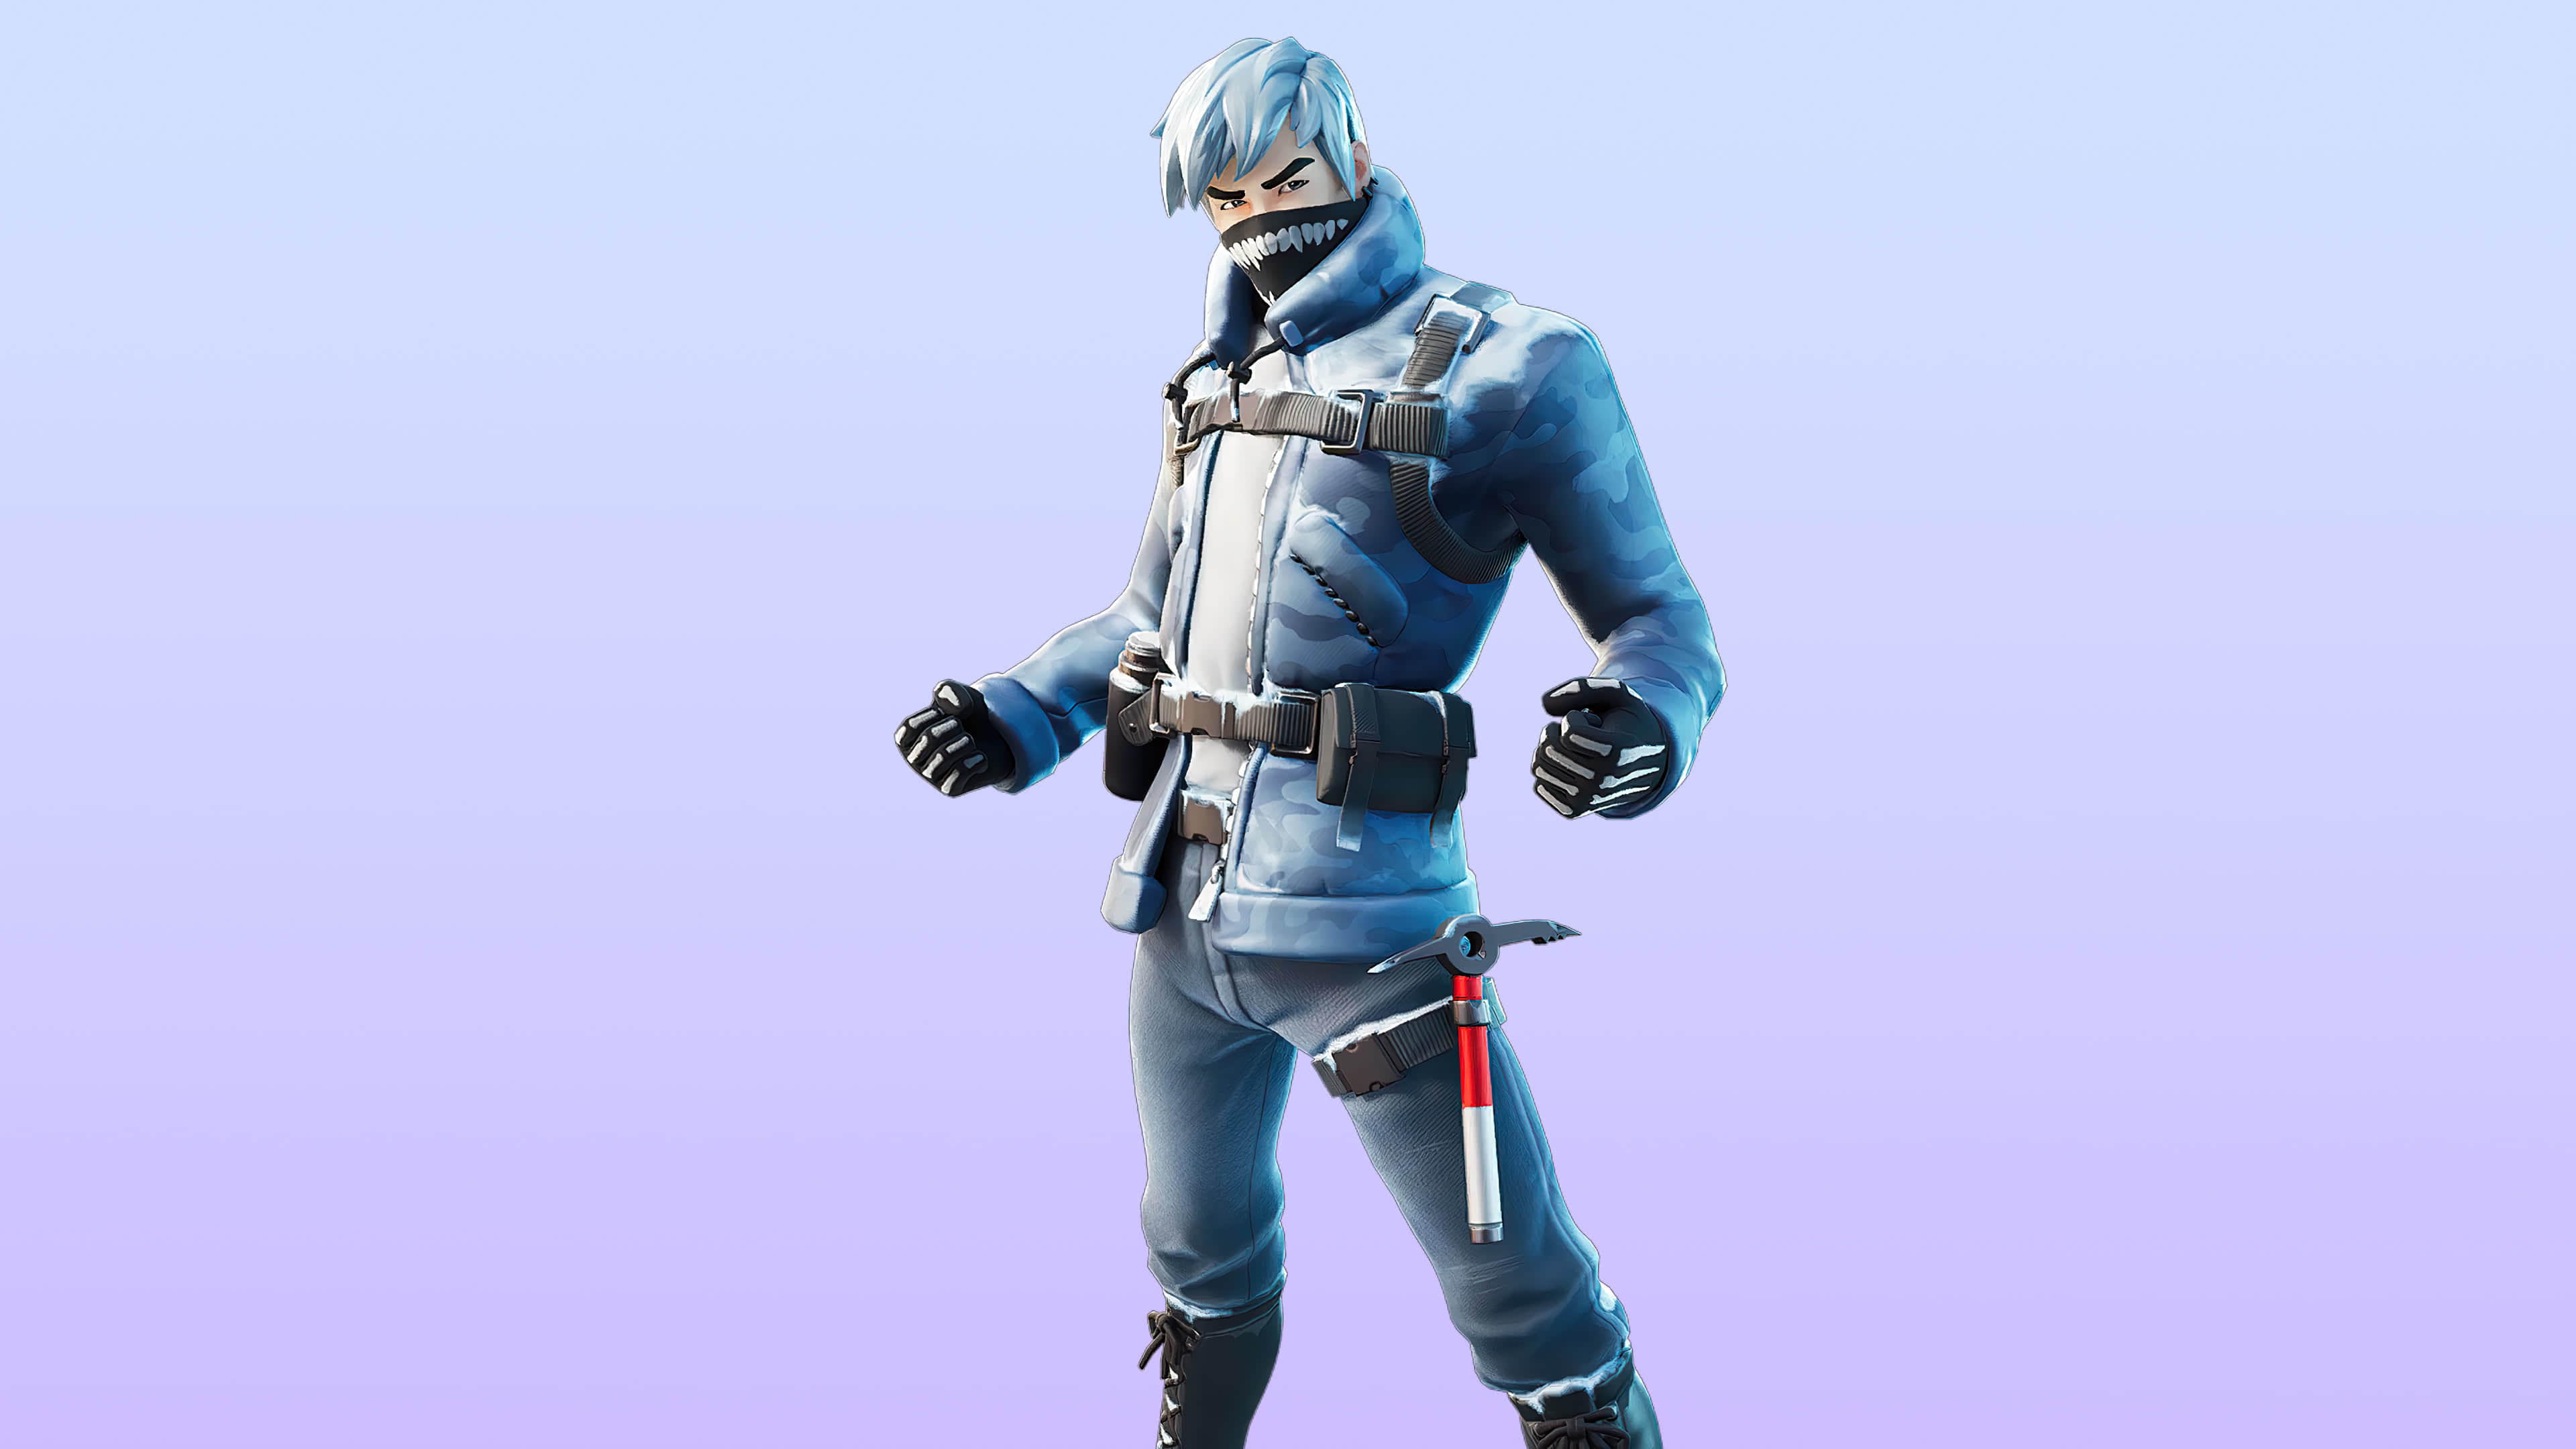 fortnite polar ice set snow patroller skin outfit uhd 4k wallpaper